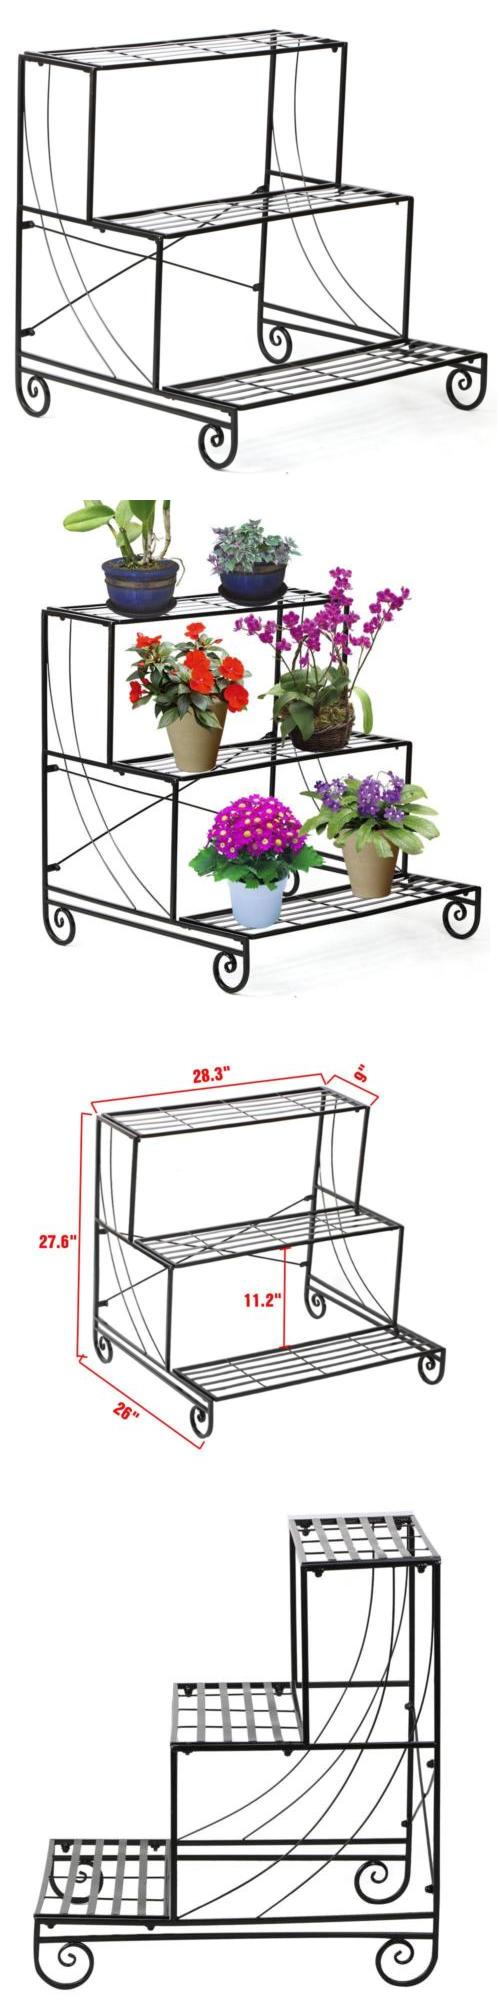 Plant Stands 29514: 3 Tier Metal Plant Stand Garden Decorative Planter  Holder Flower Pot Shelf